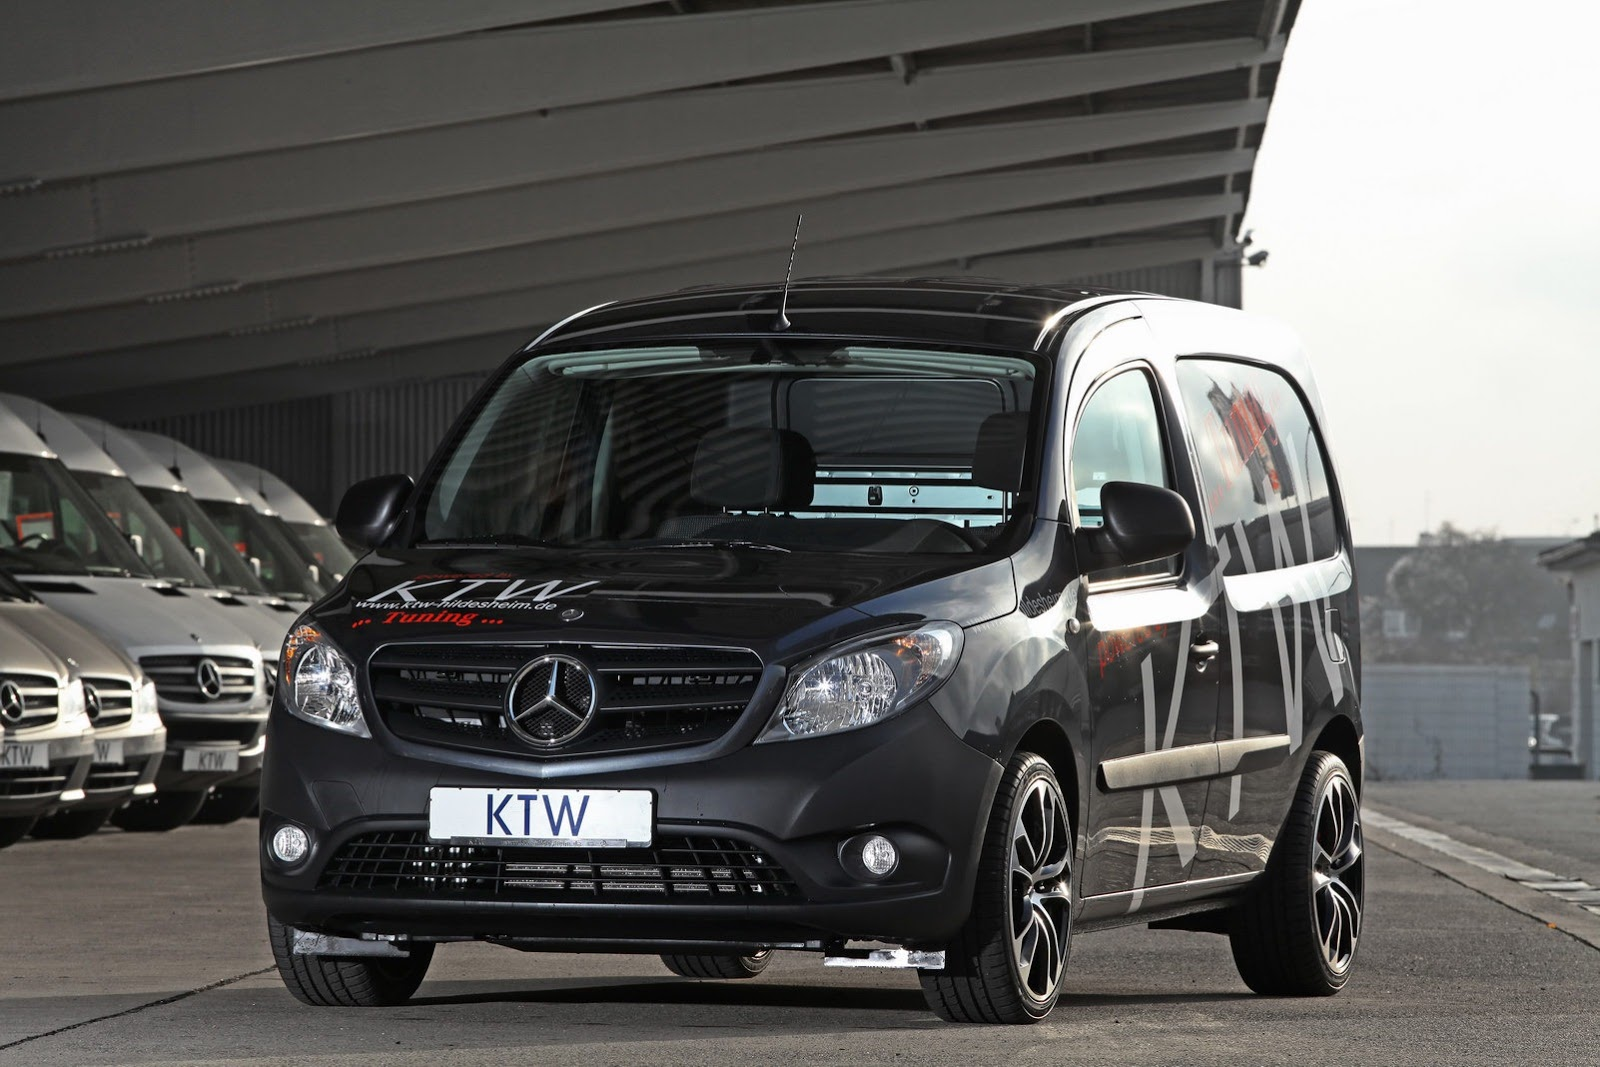 cars service mercedes citan by ktw tuning. Black Bedroom Furniture Sets. Home Design Ideas